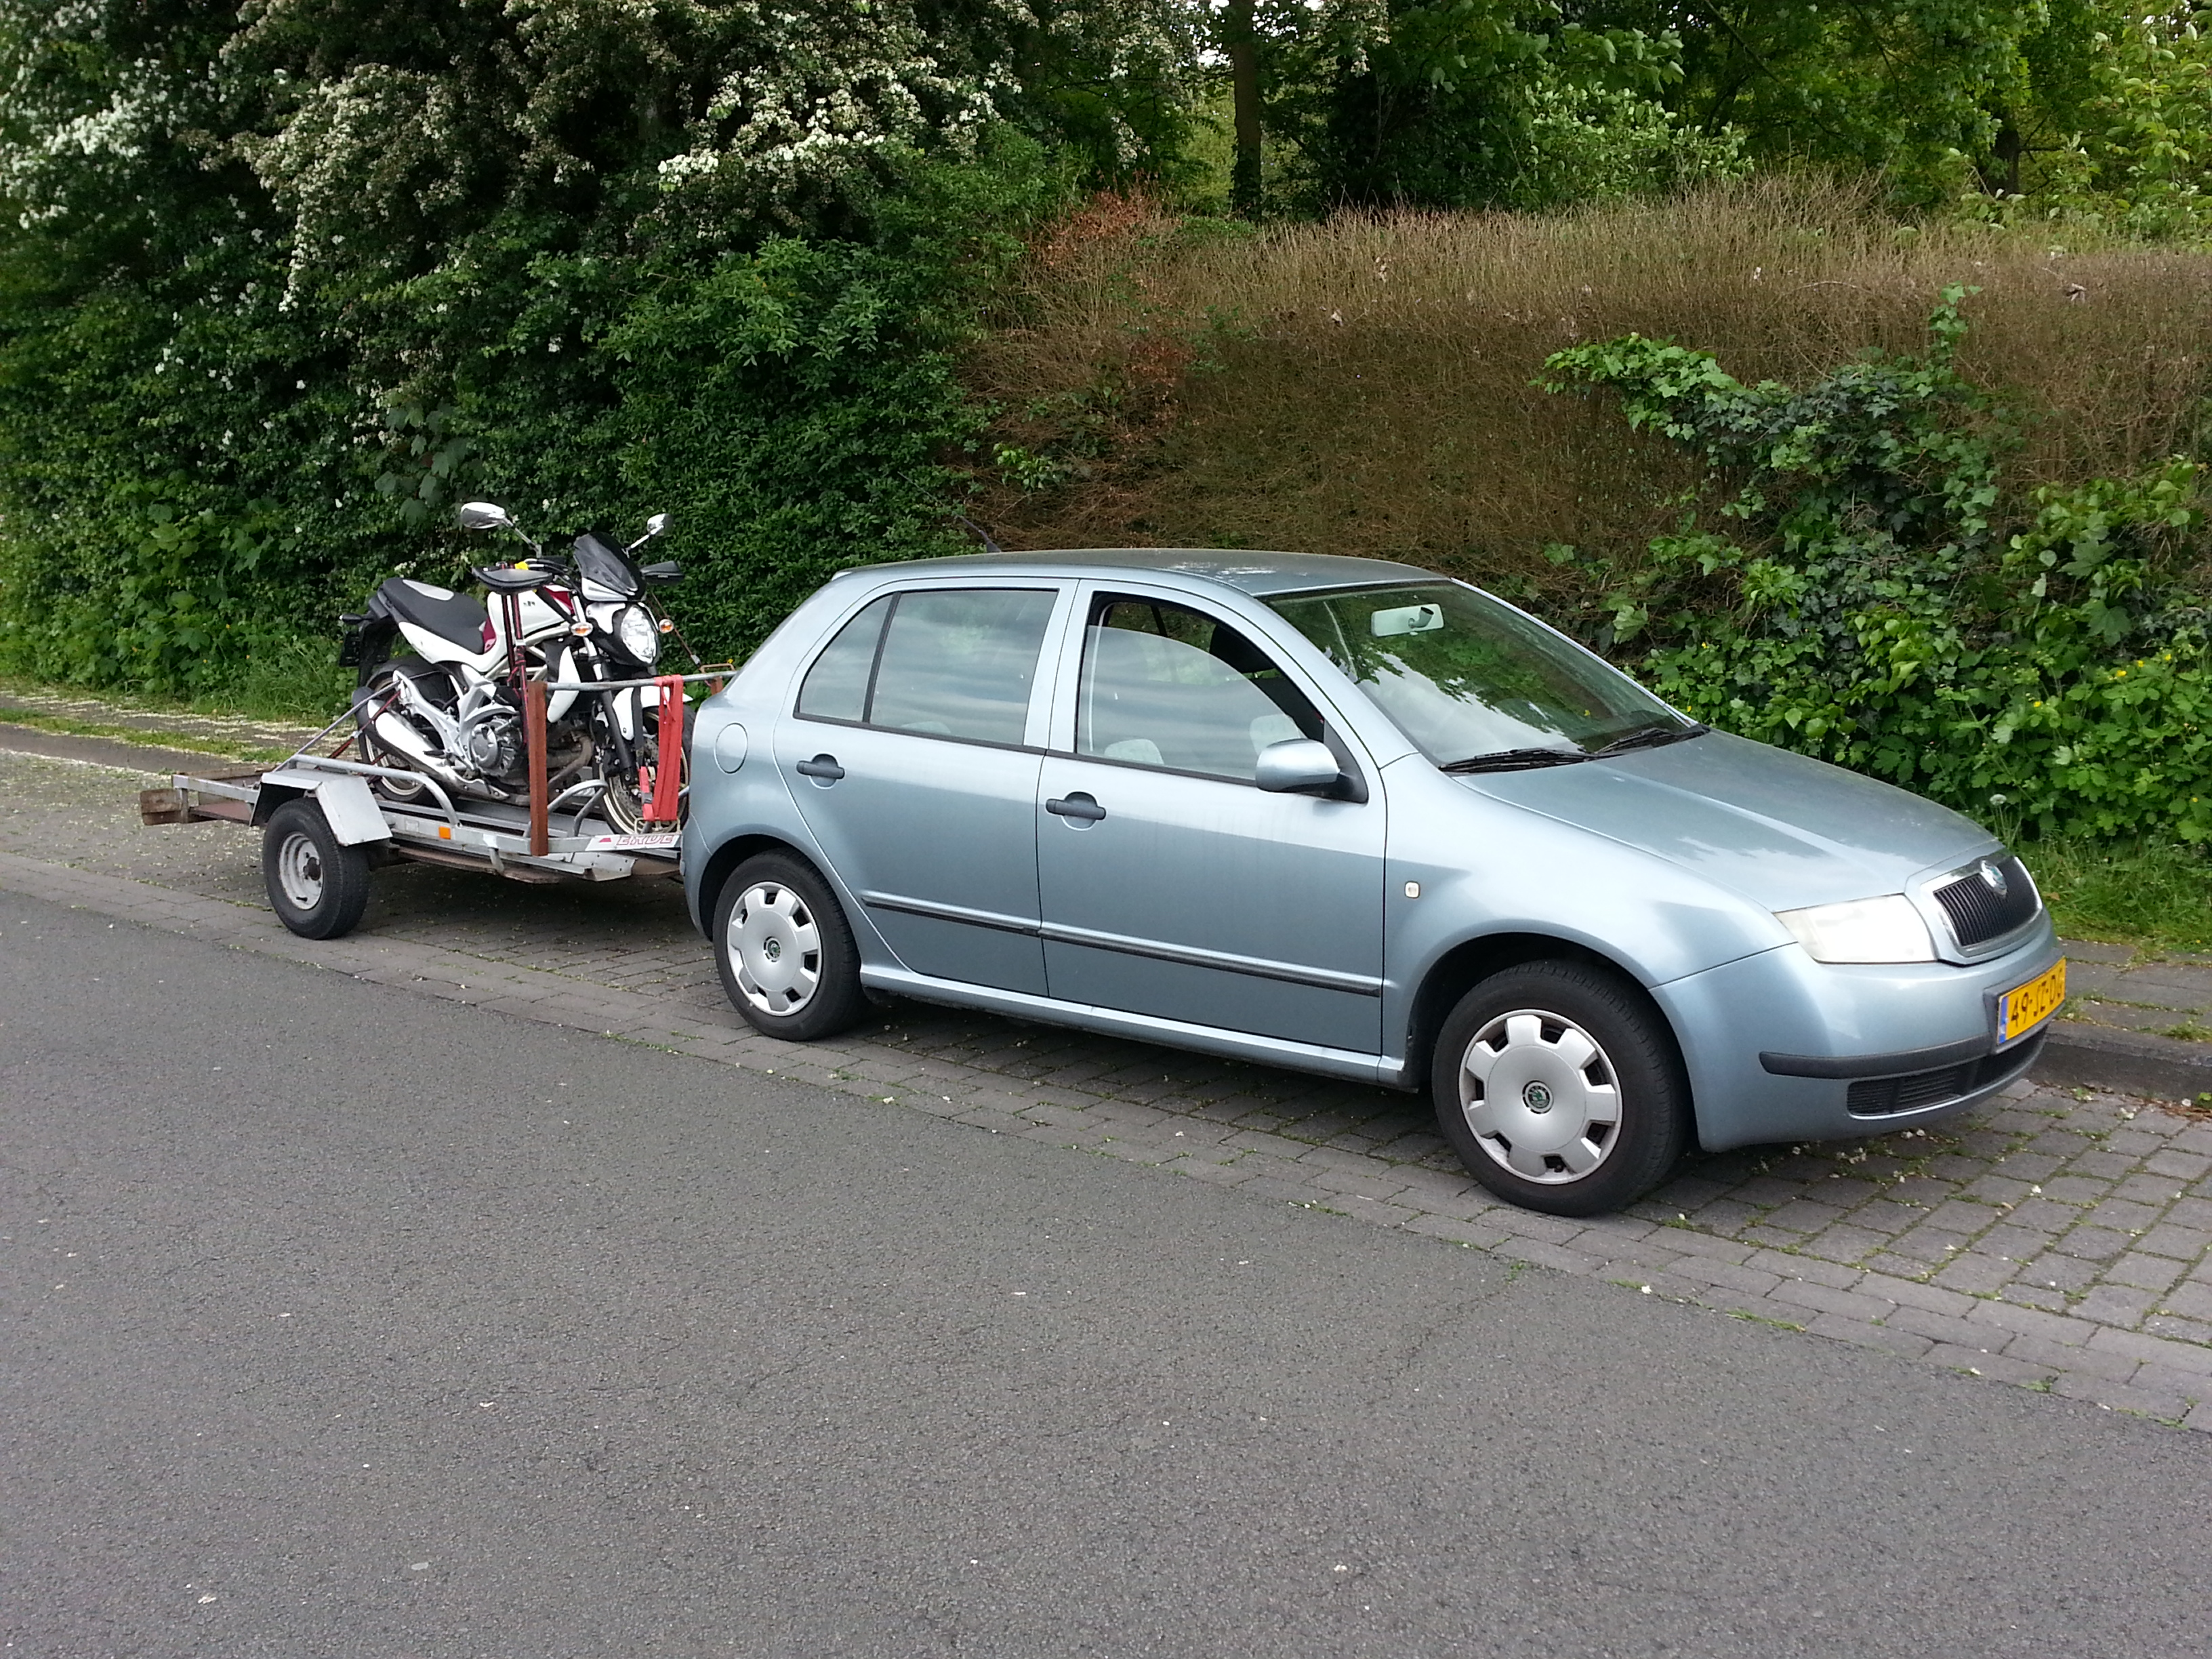 Bromfiets Scooter Rijbewijs Rotterdam Ommoord